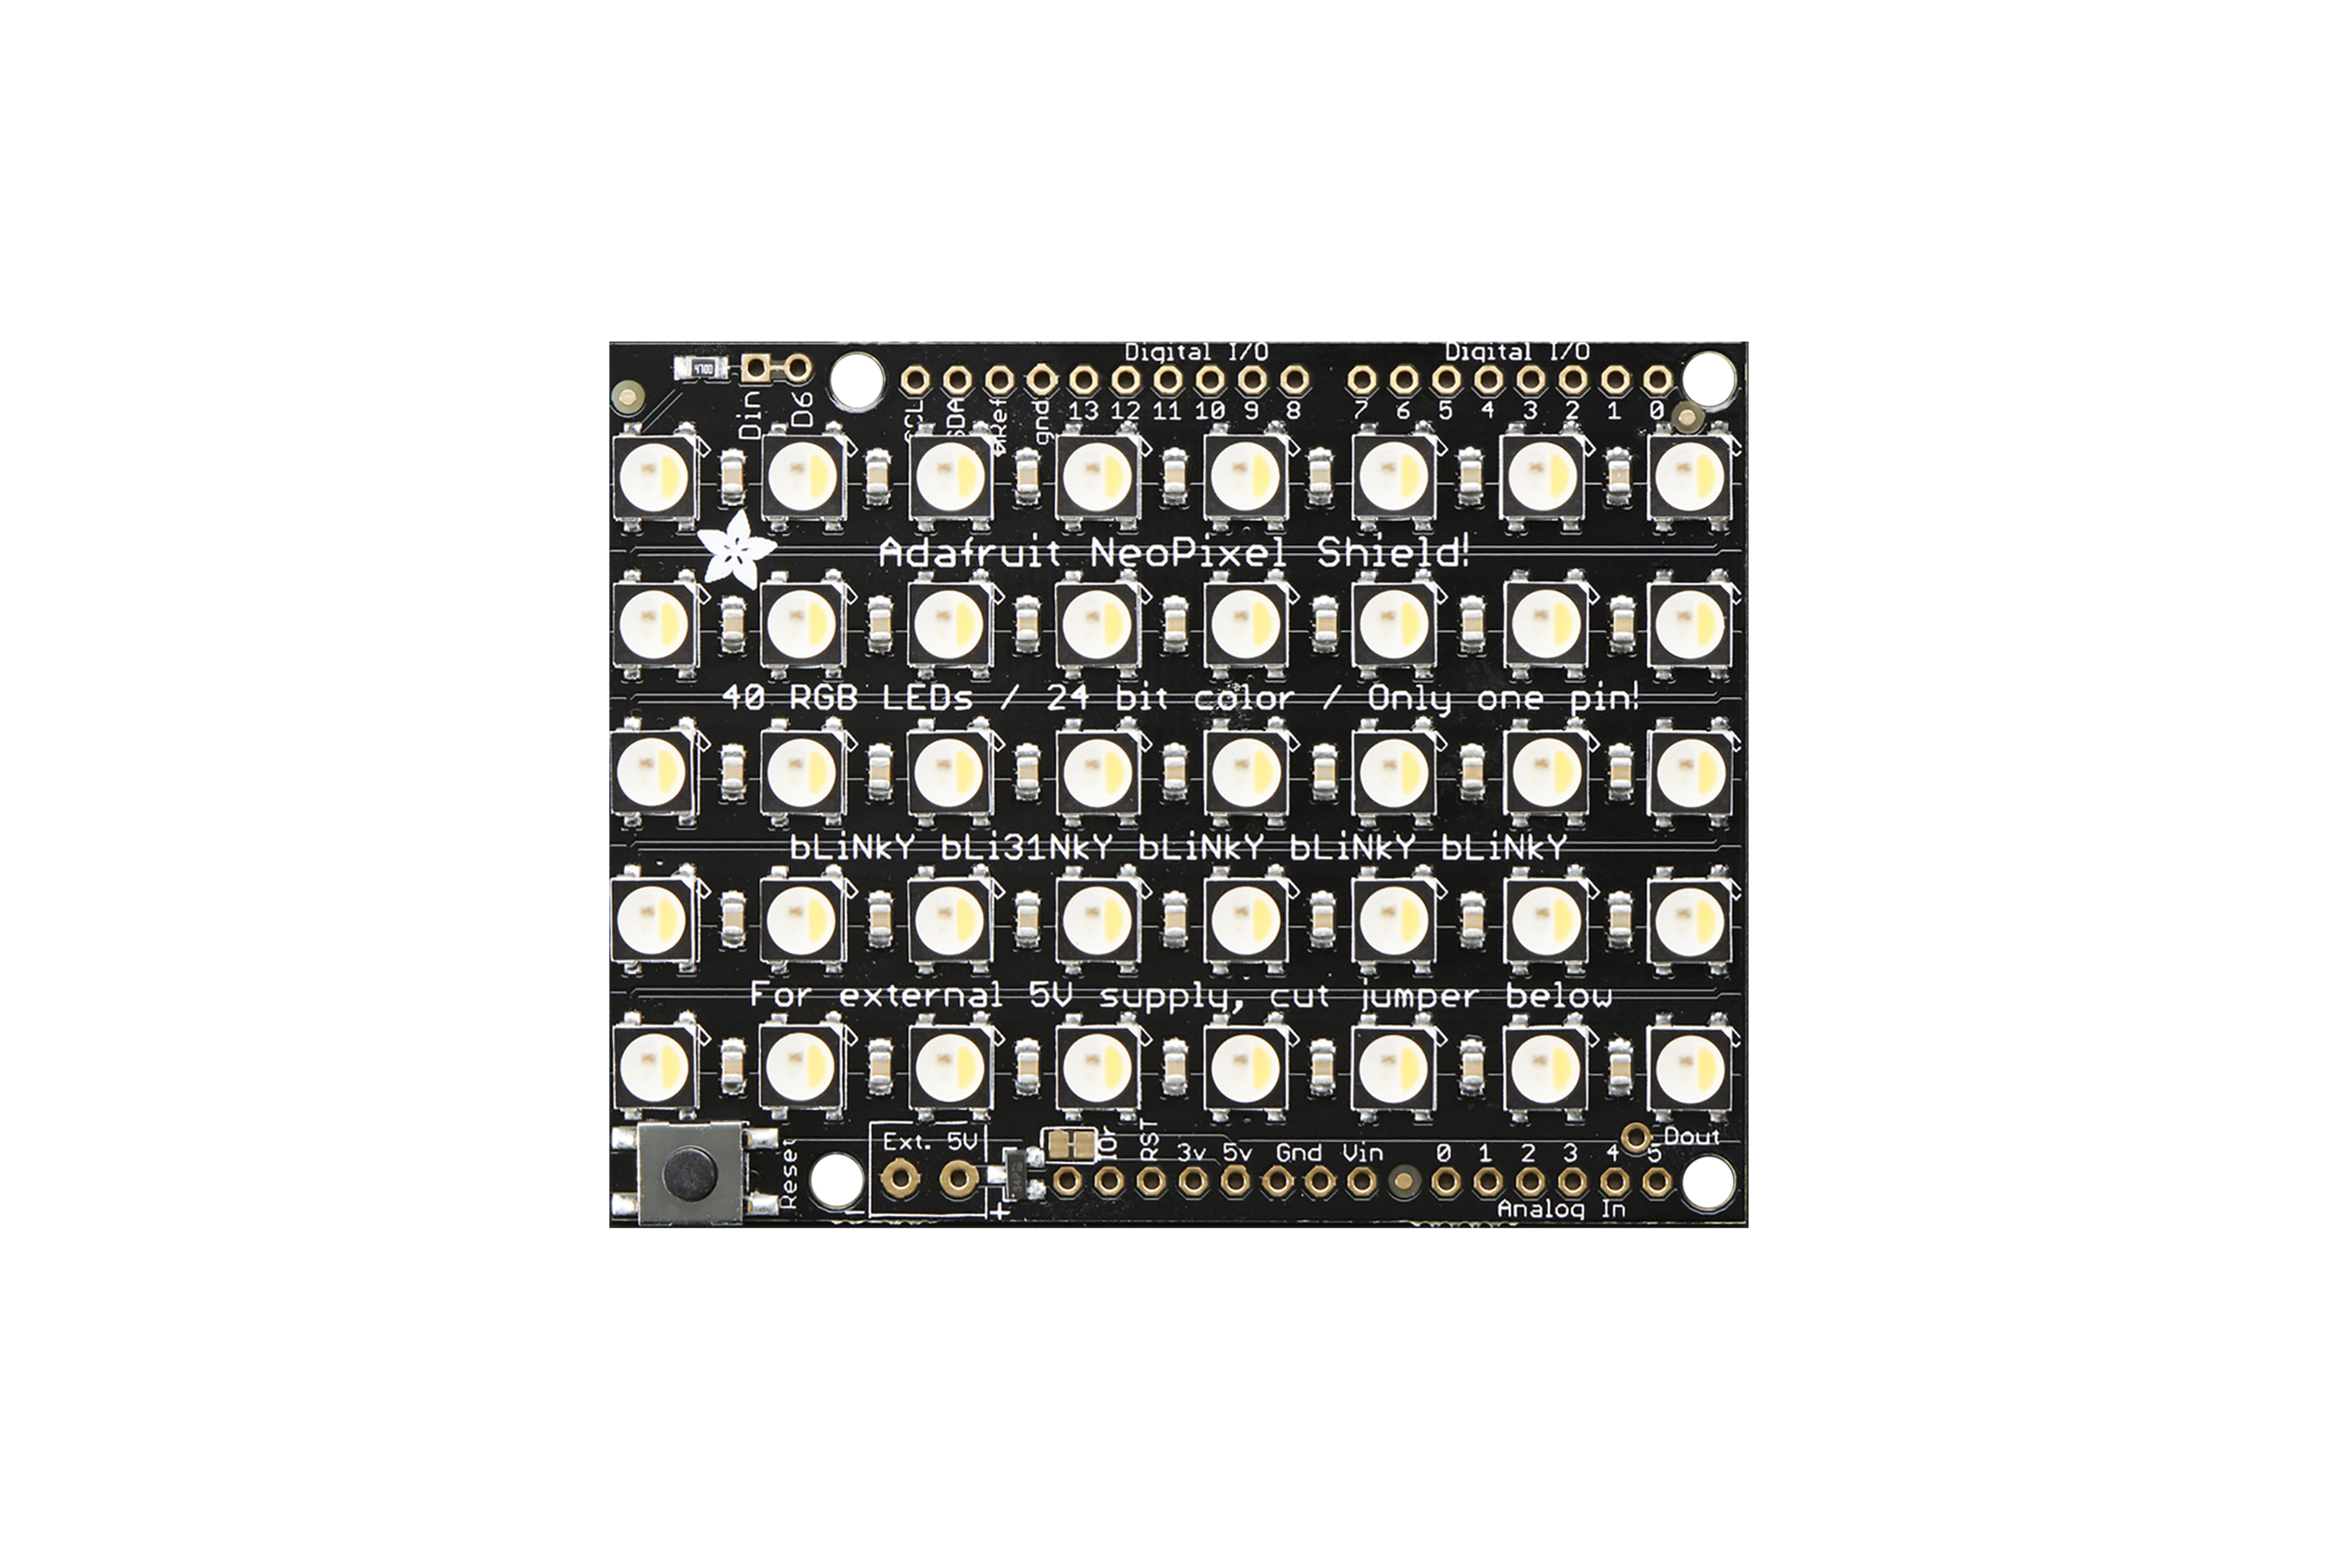 SCUDO NEOPIXEL 40 RGBWSCUDO LED 3000K